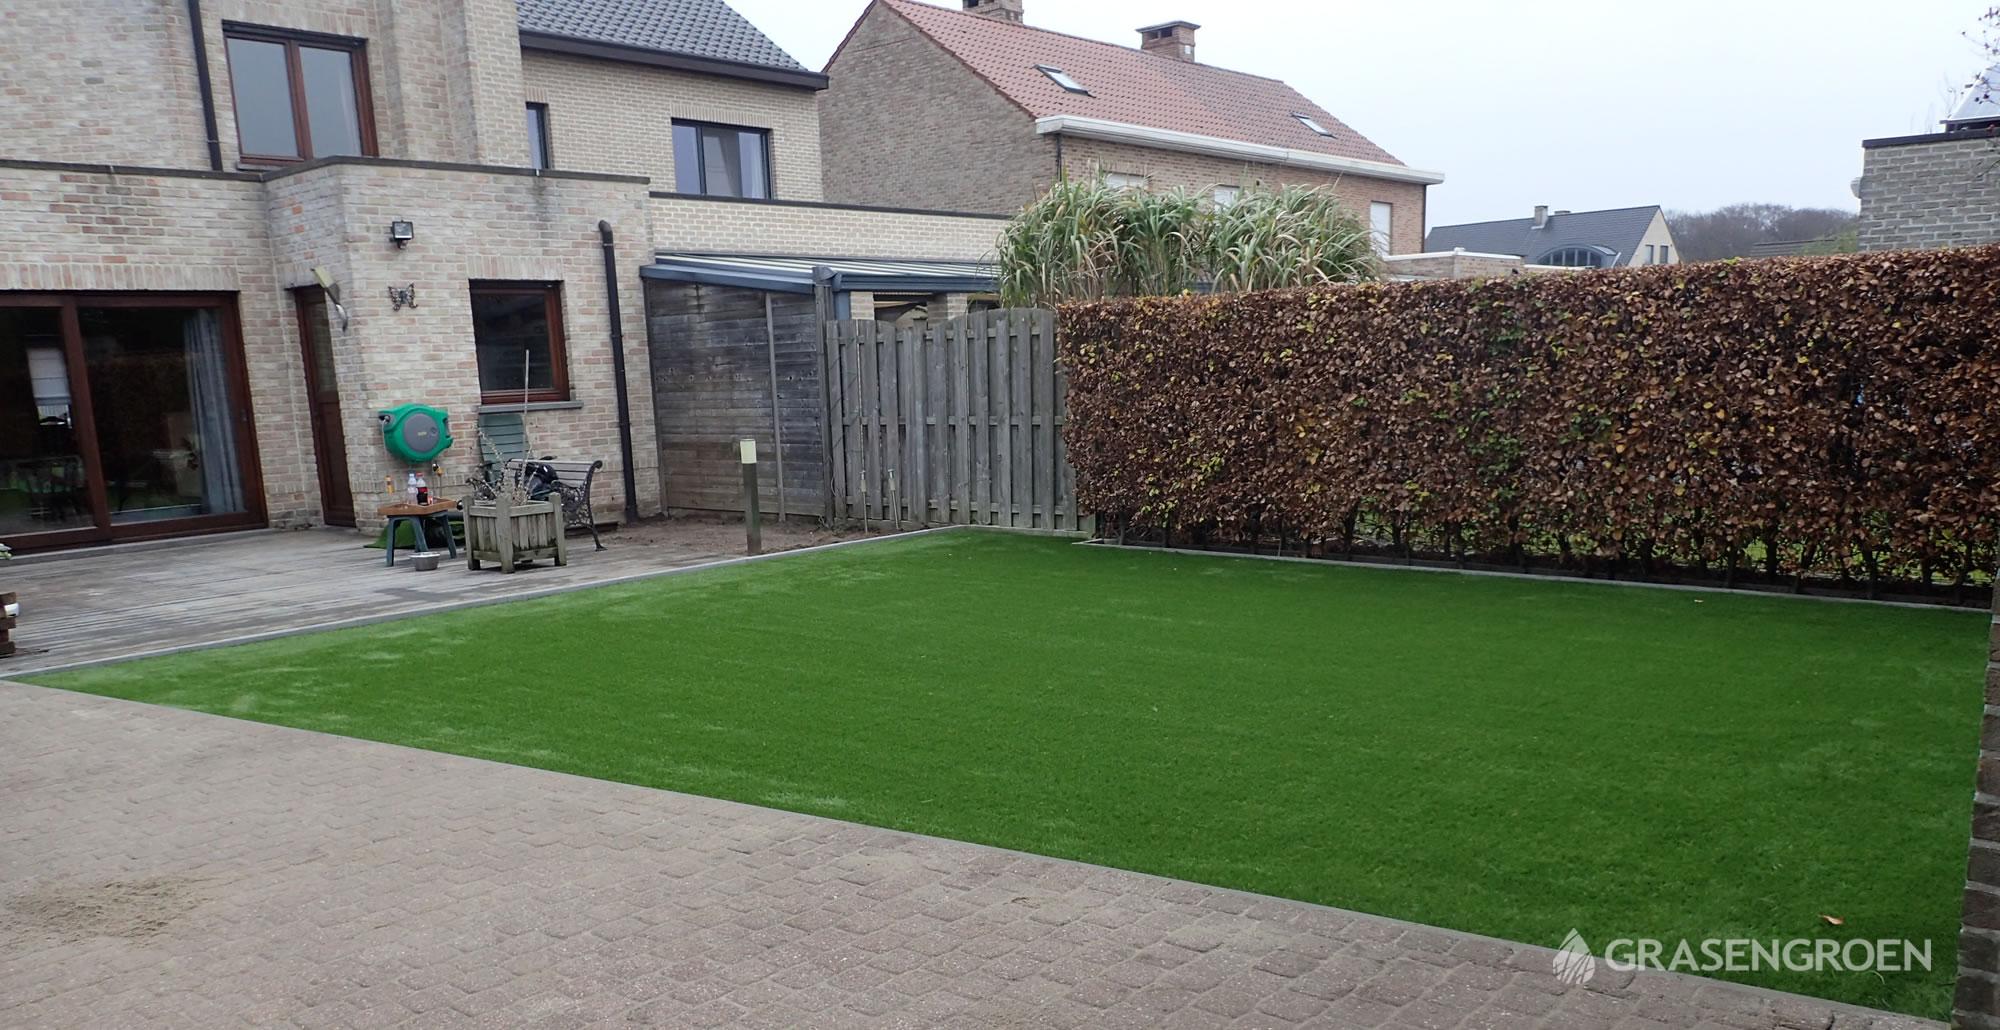 Kunstgrasleggennijlen17 • Gras en Groen Kunstgras